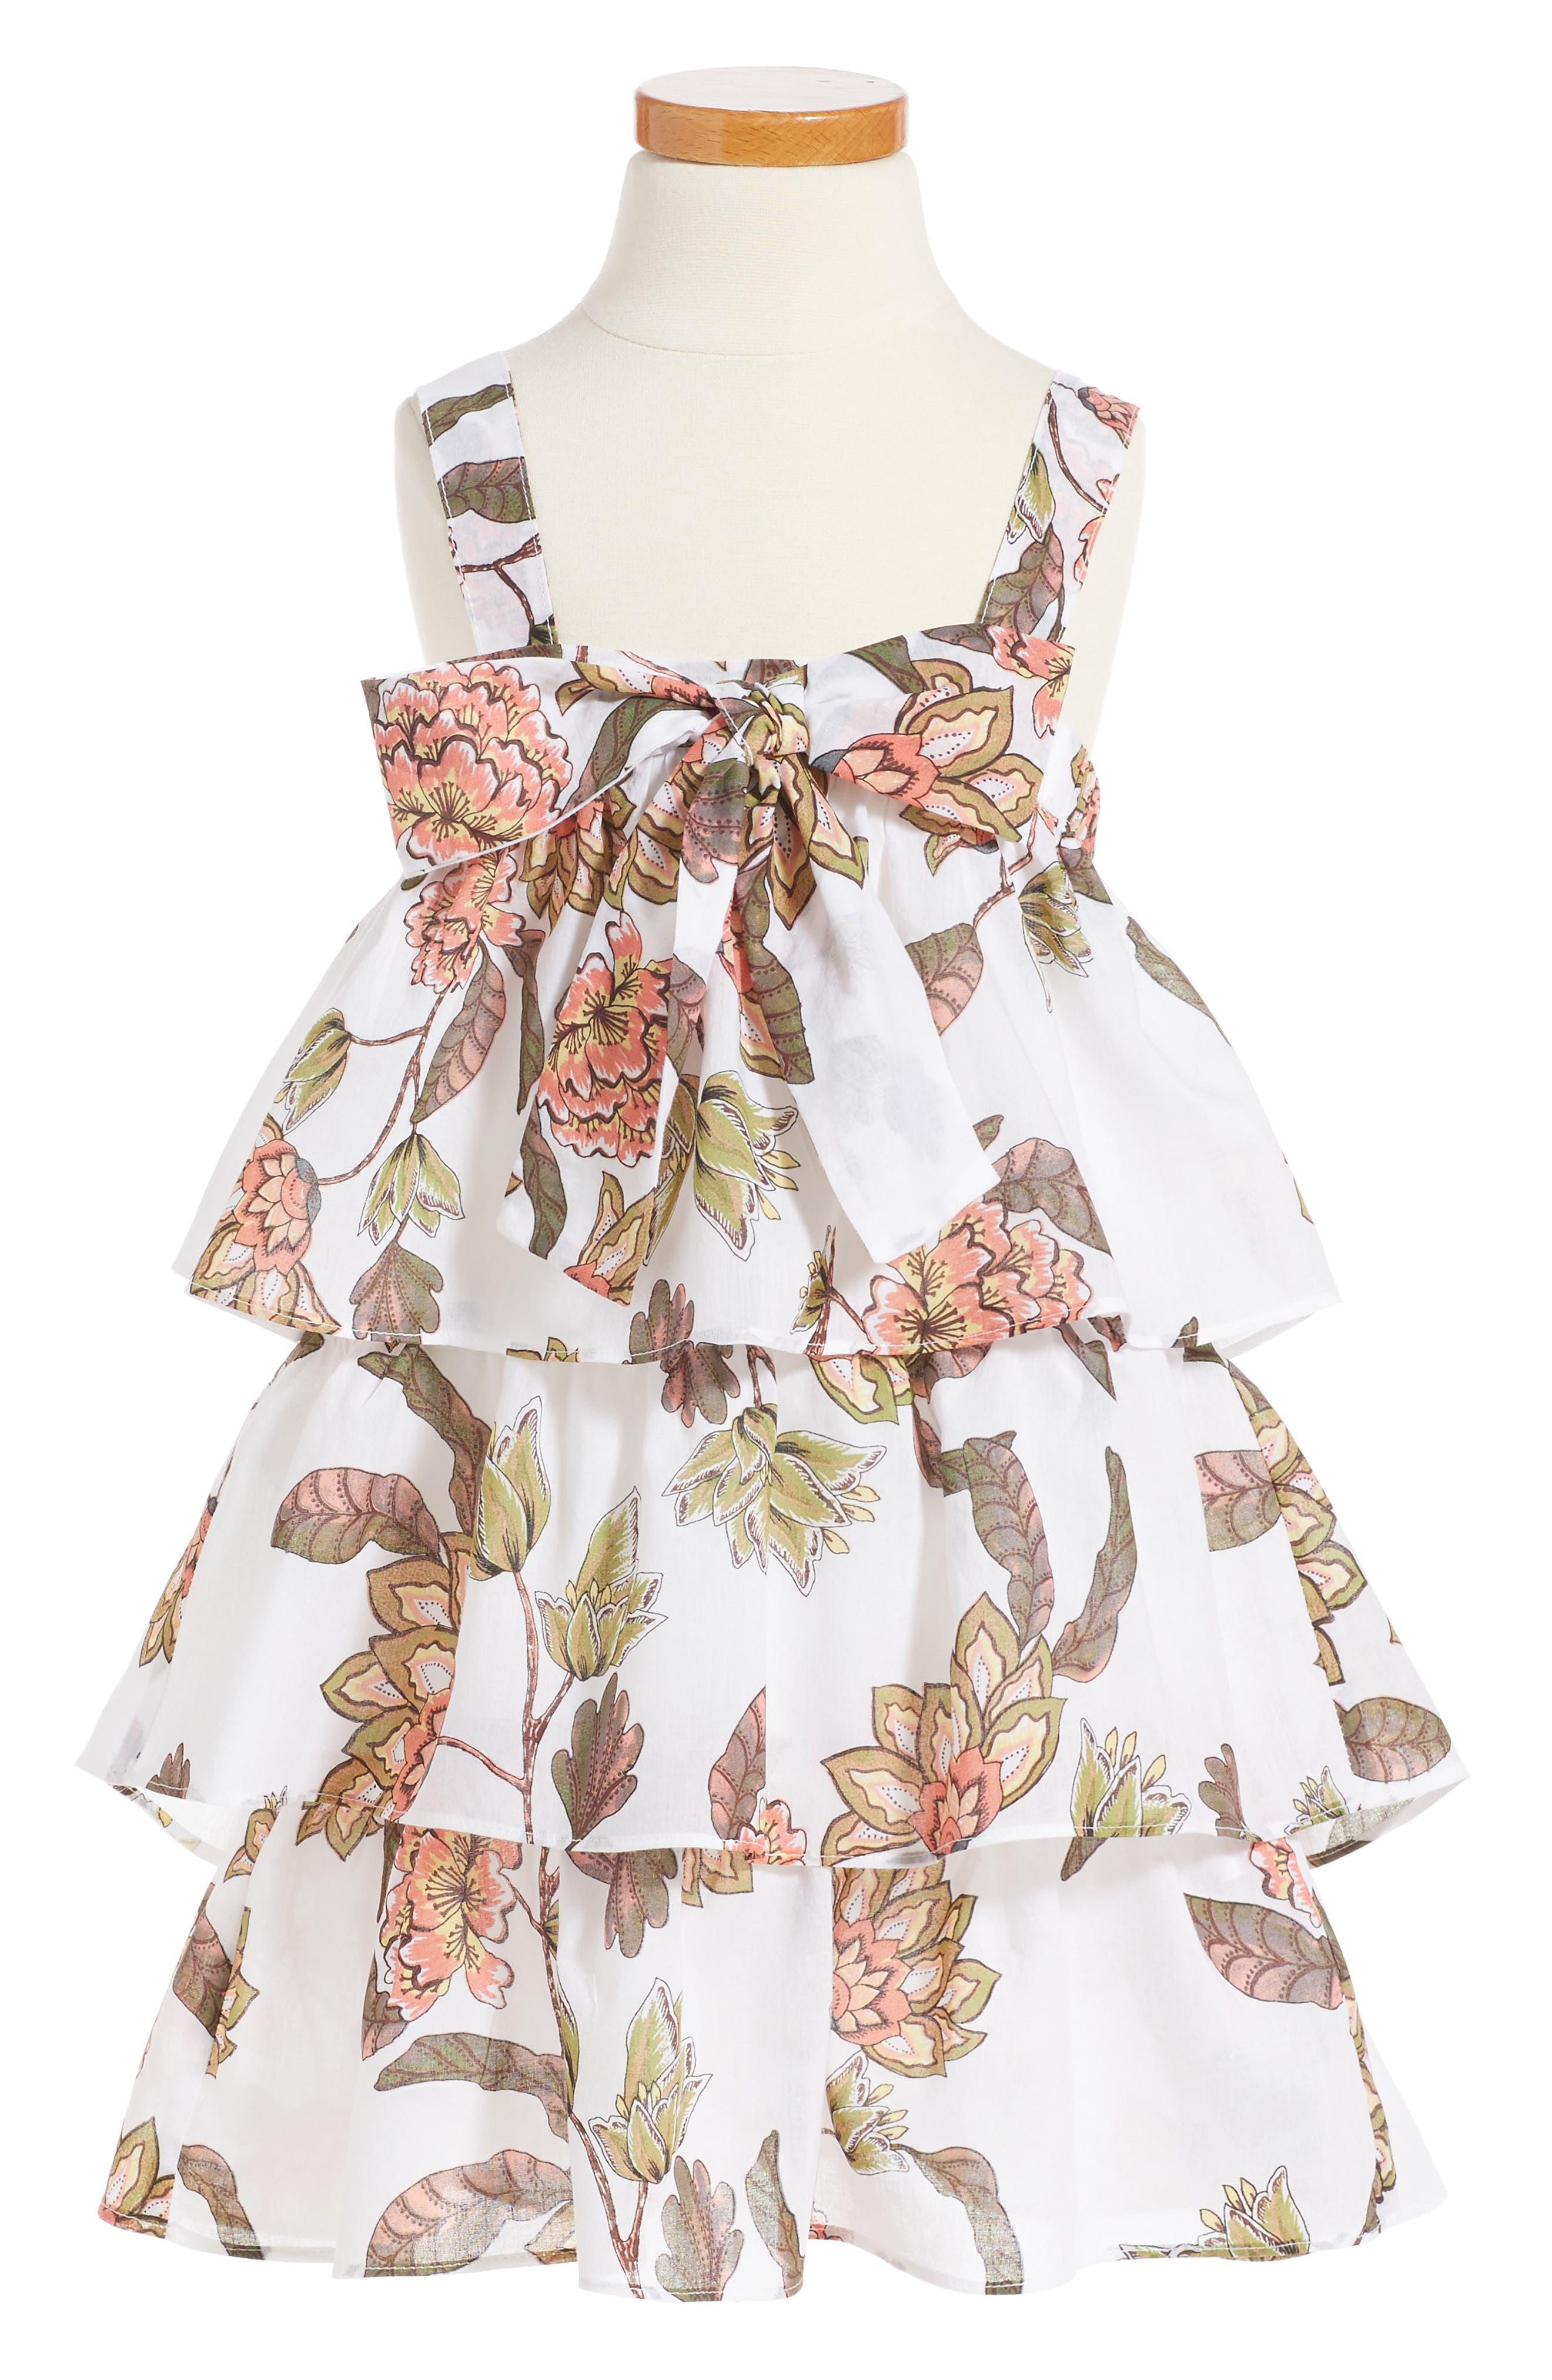 LIL LEMONS BY FOR LOVE & LEMONS For Love & Lemons Flower Power Tank Dress